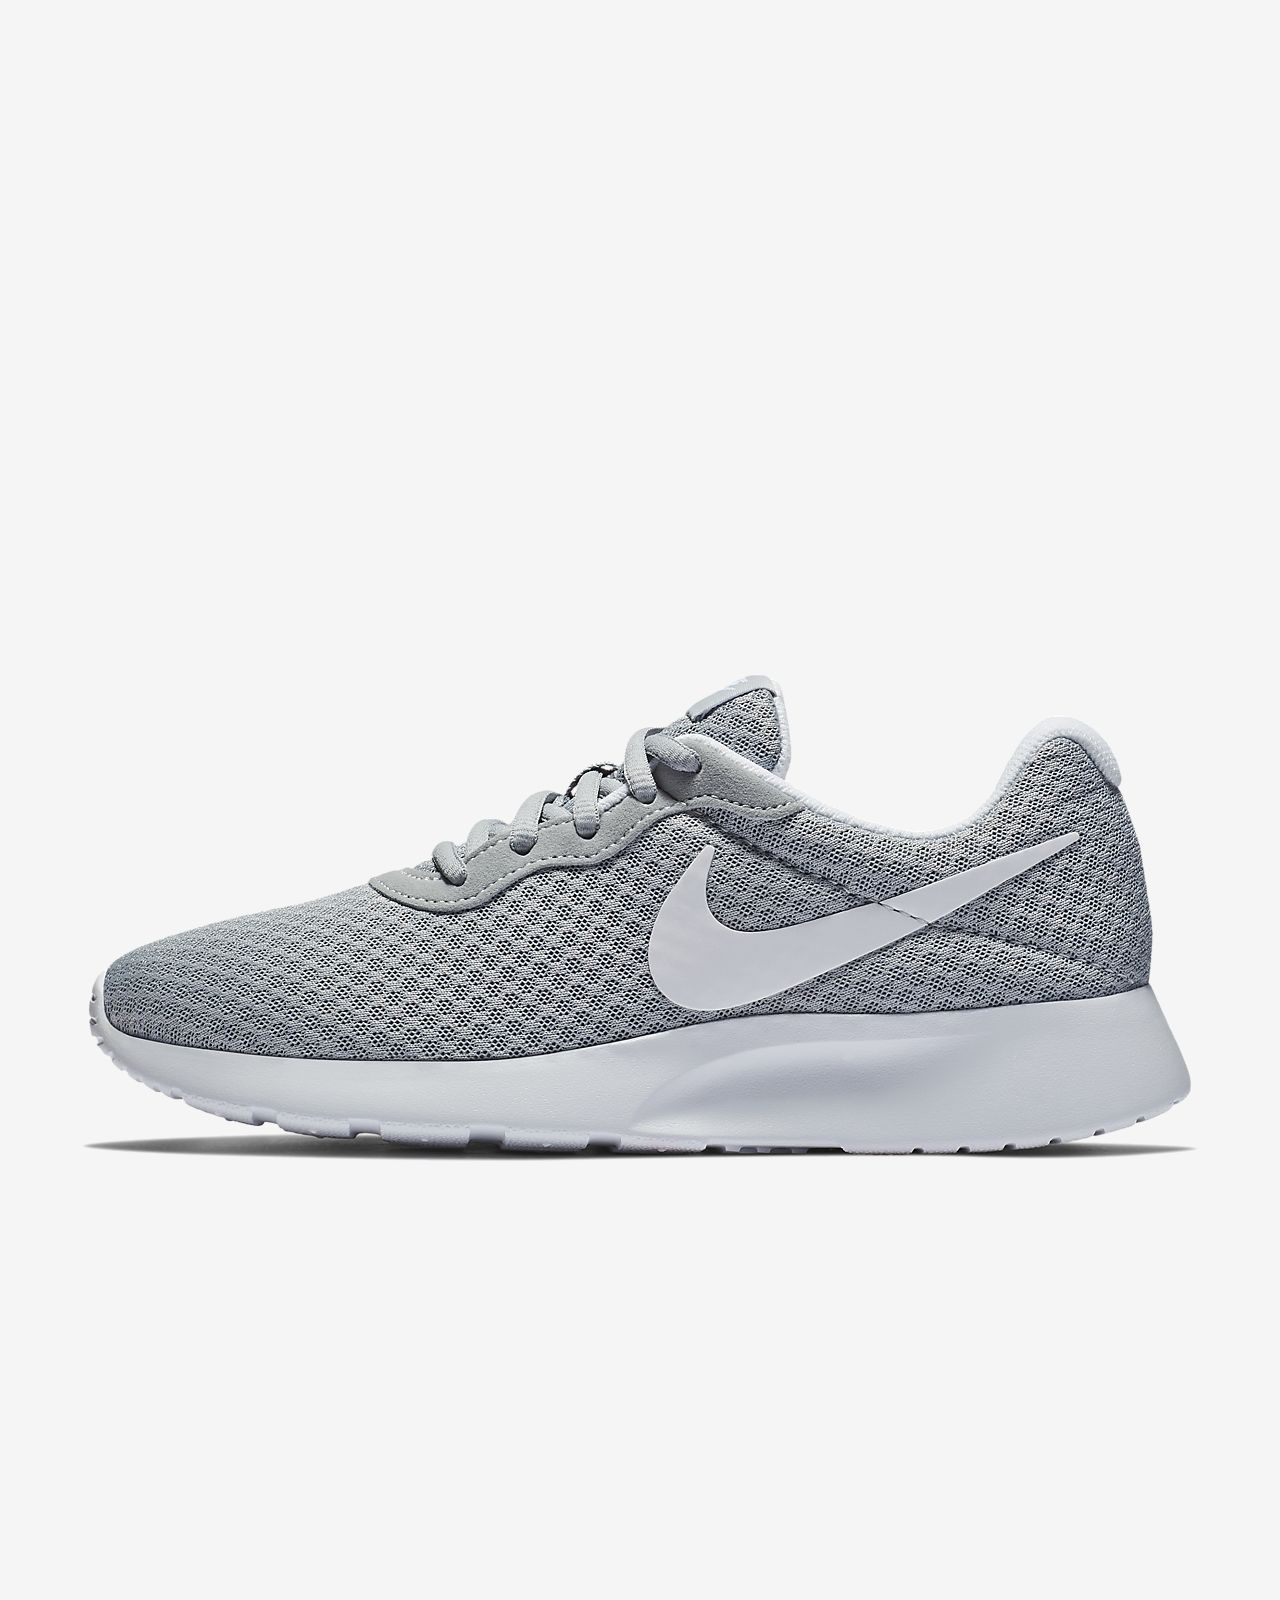 25467e6ebe Low Resolution Sapatilhas Nike Tanjun para mulher Sapatilhas Nike Tanjun  para mulher